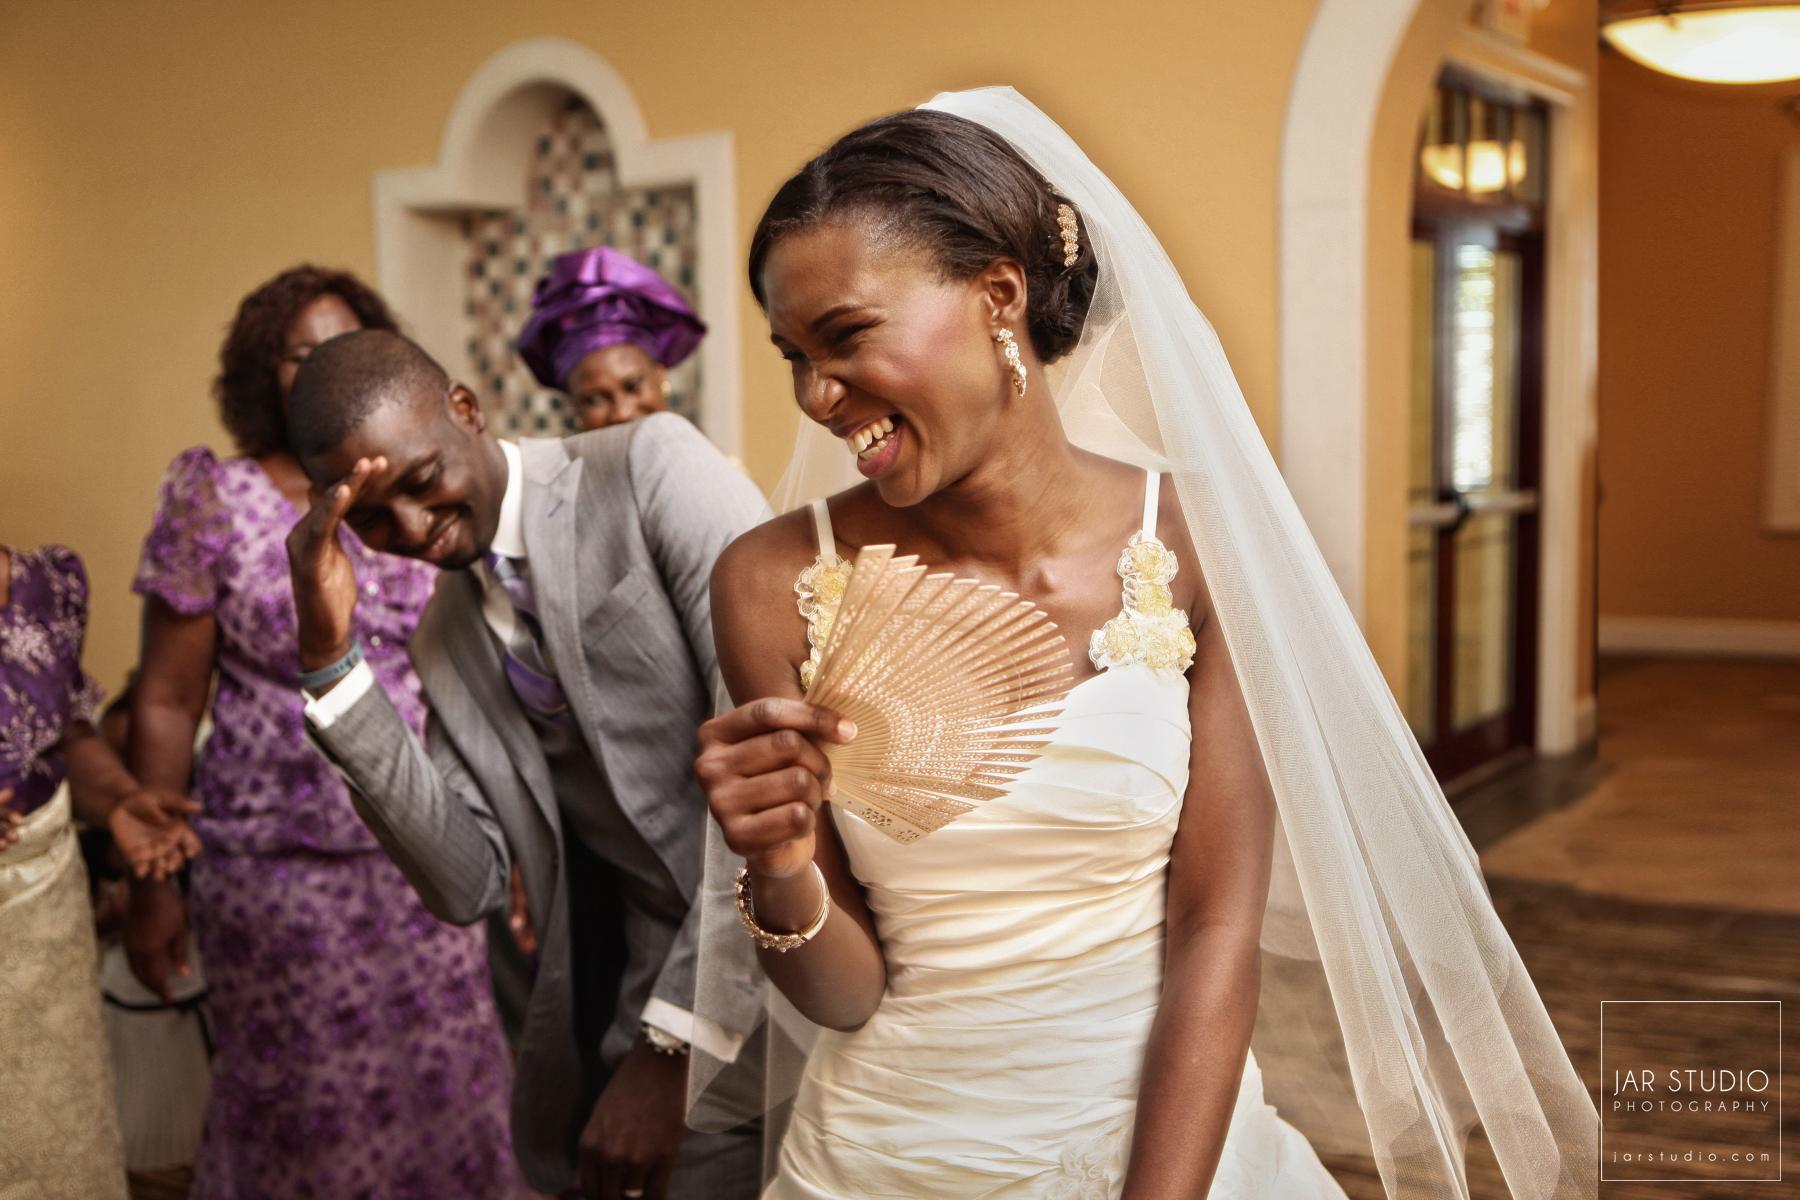 34-fun-modern-nigerian-bride-orlando-destination-wedding-photographer-jarstudio.JPG